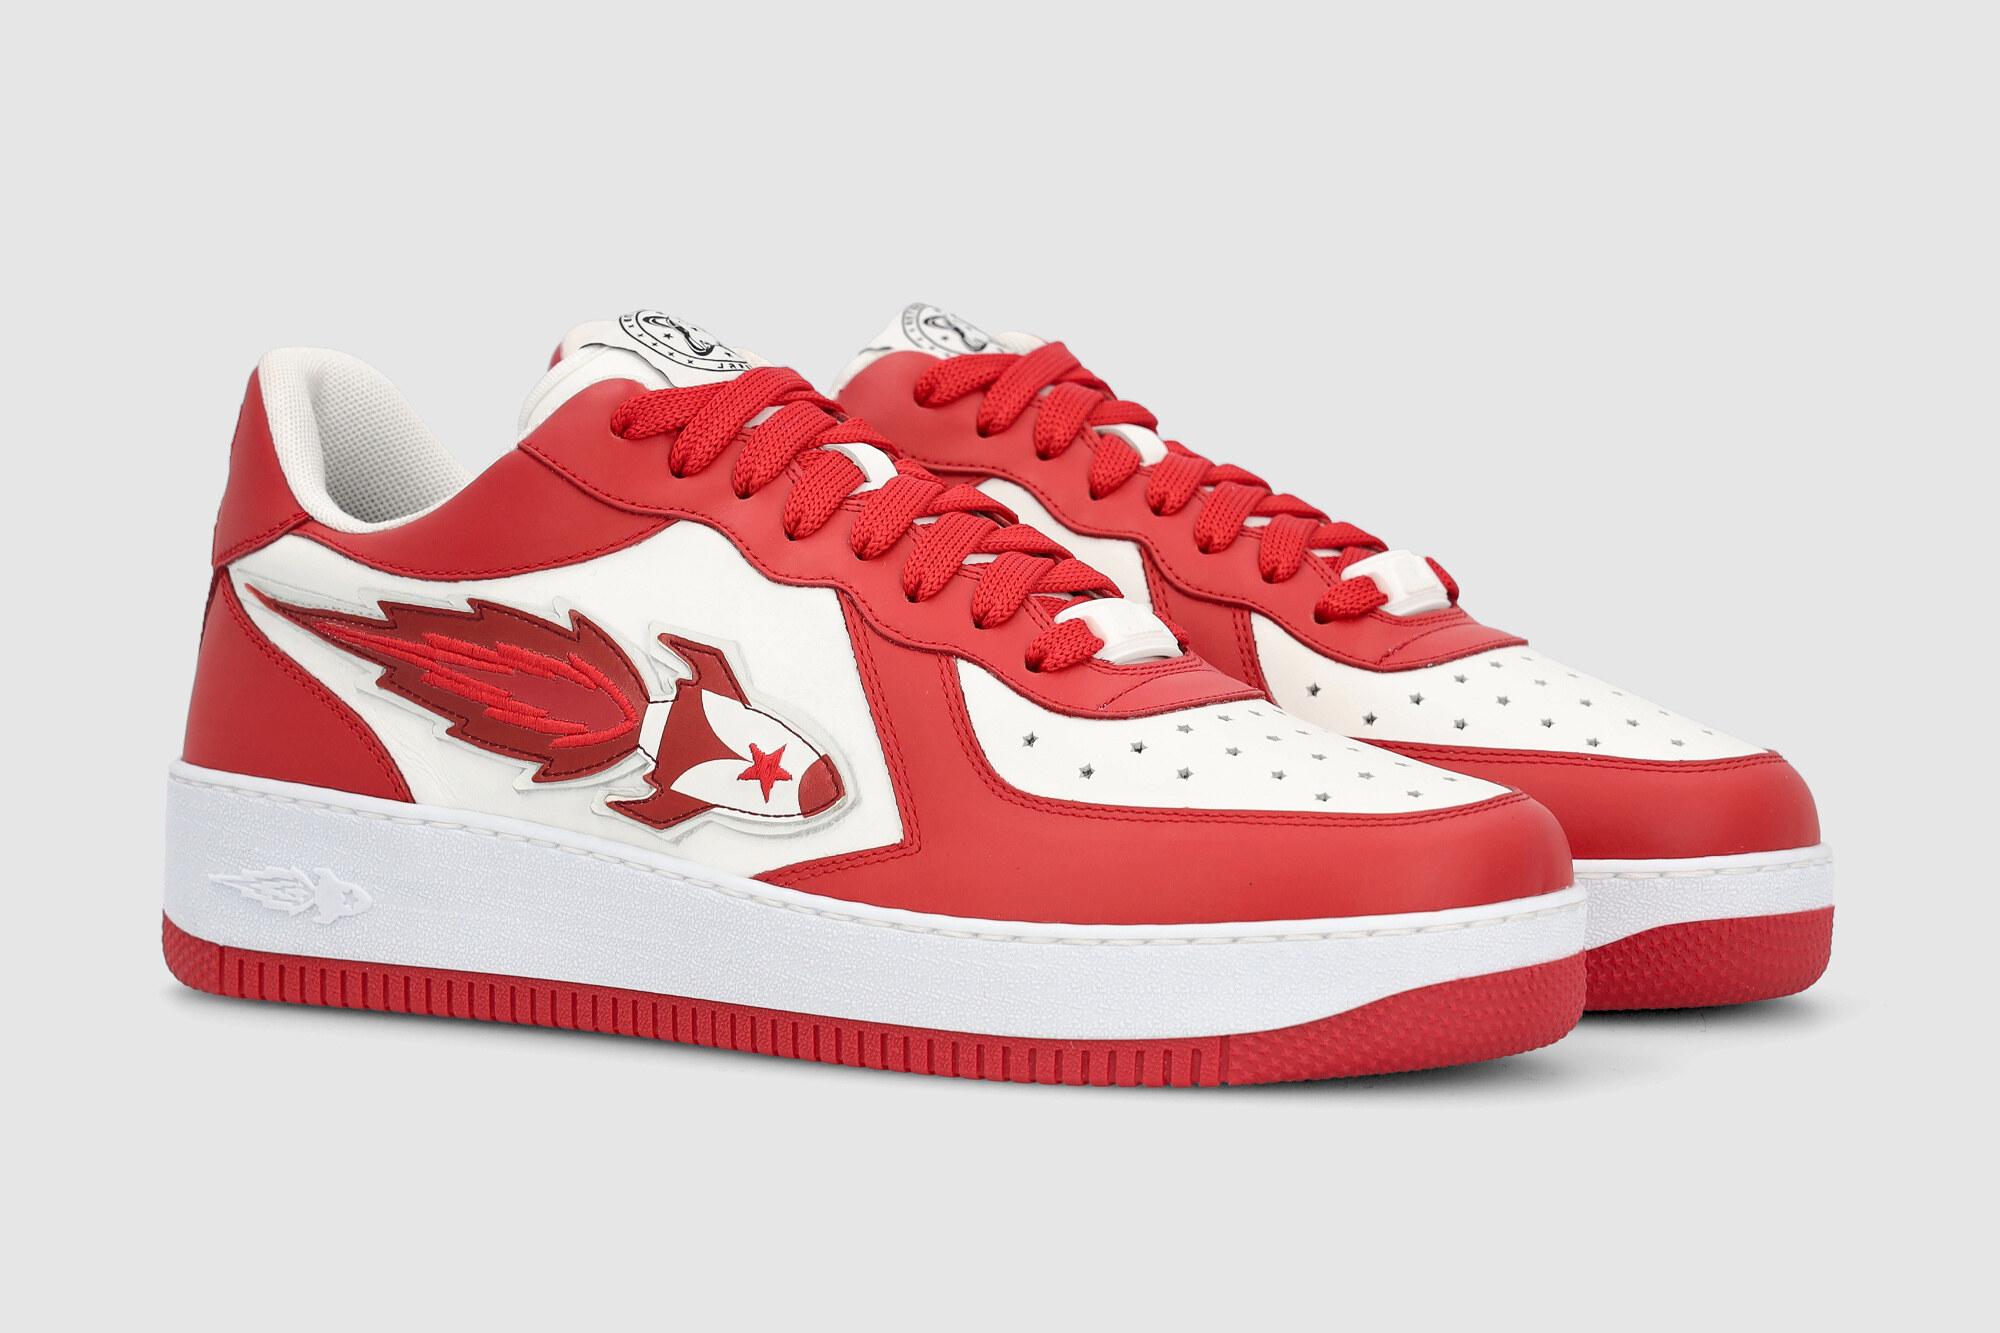 Enterprise Japan Drop 1 Rocket Low Sneakers